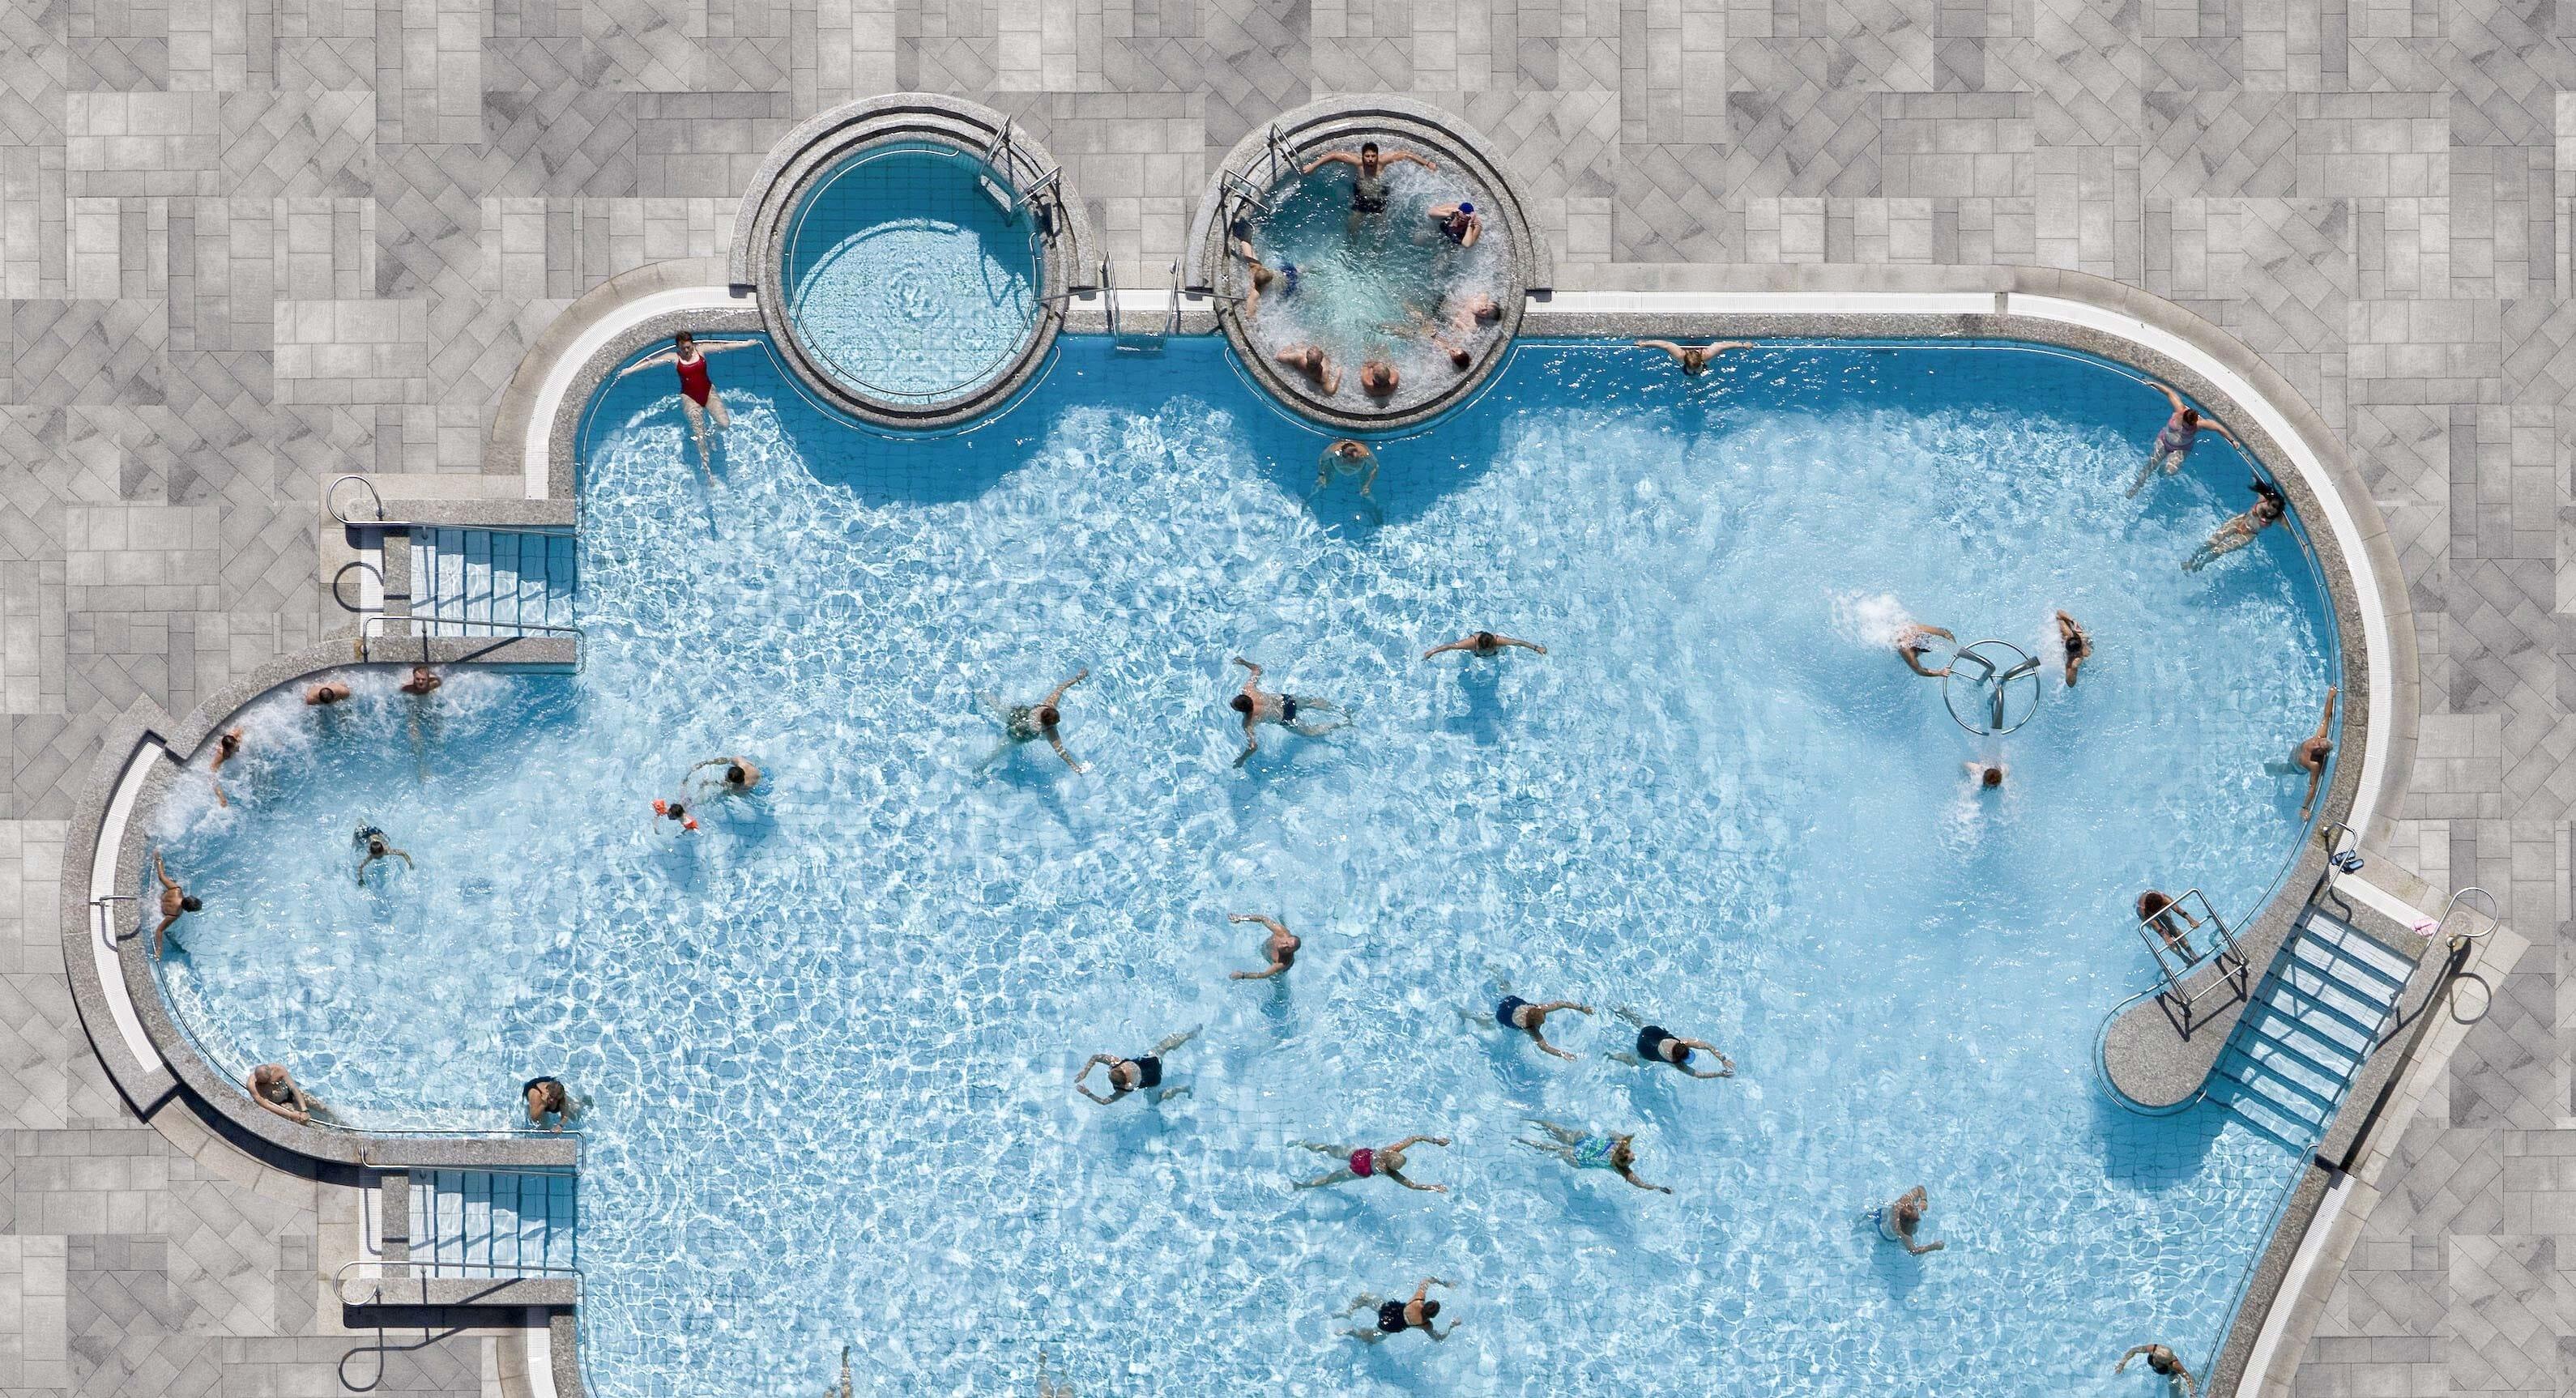 Spectacular Aerial Pools By Stephan Zirwes